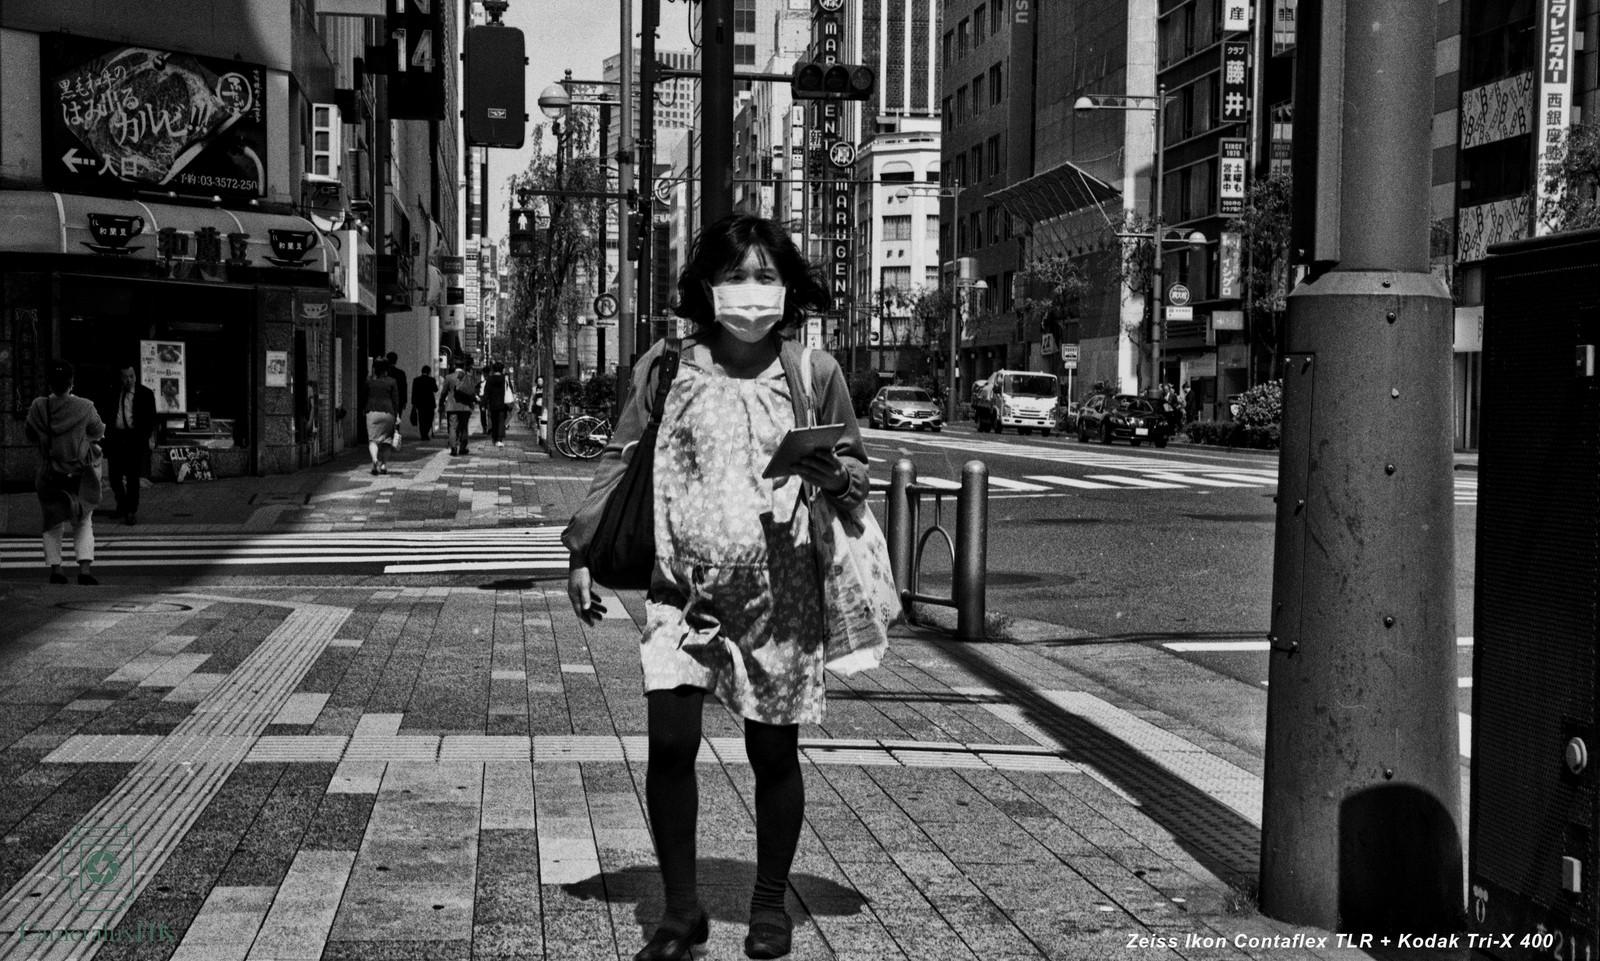 Zeiss Ikon + Kodak